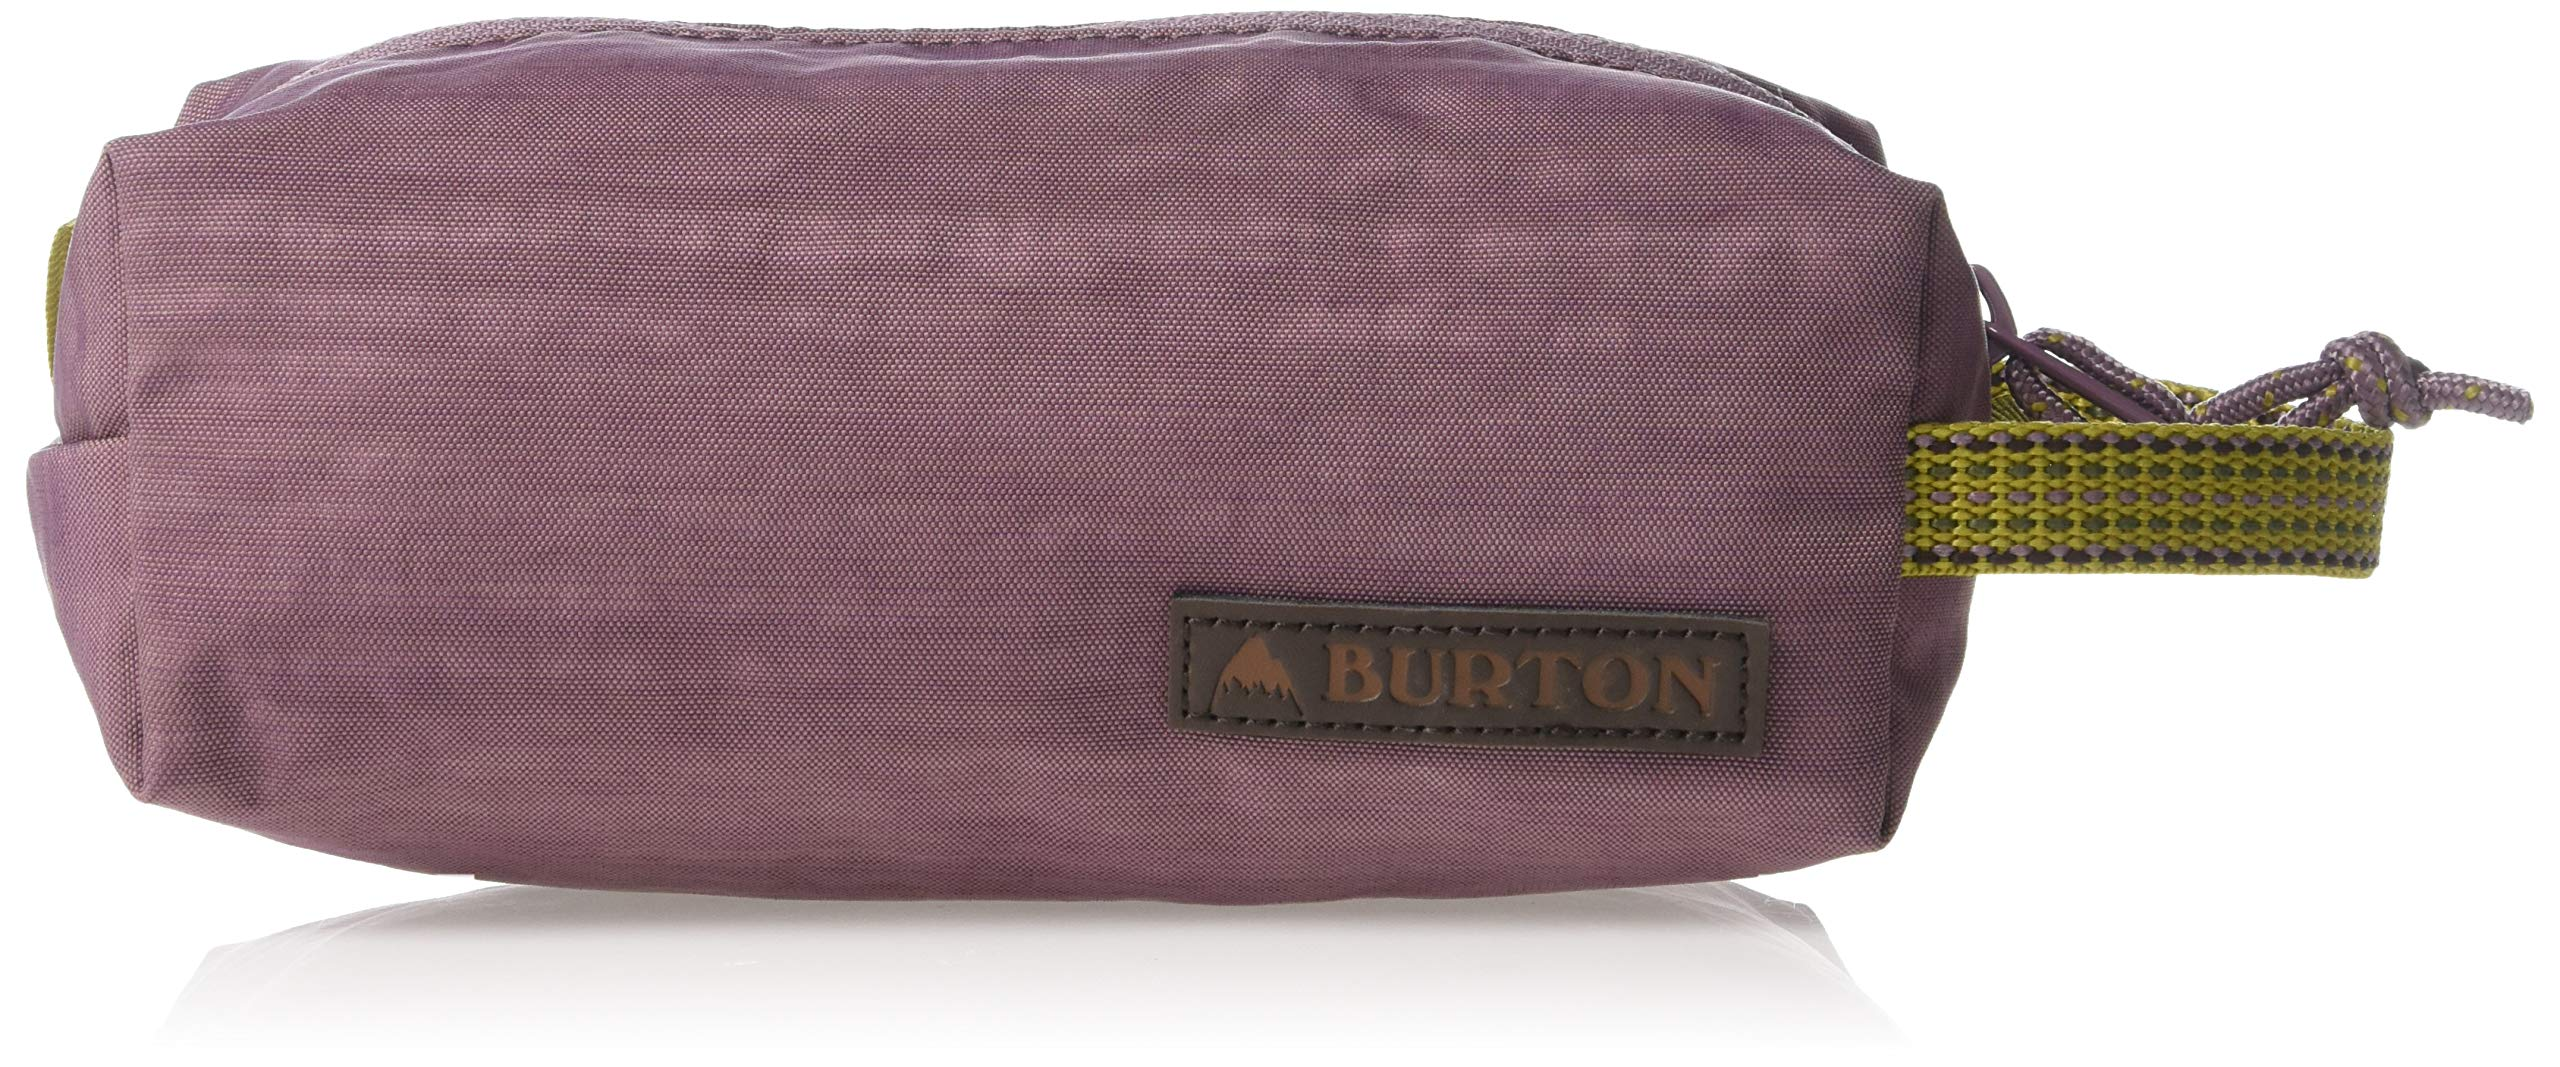 Burton Accessory Case, Flint Crinkle